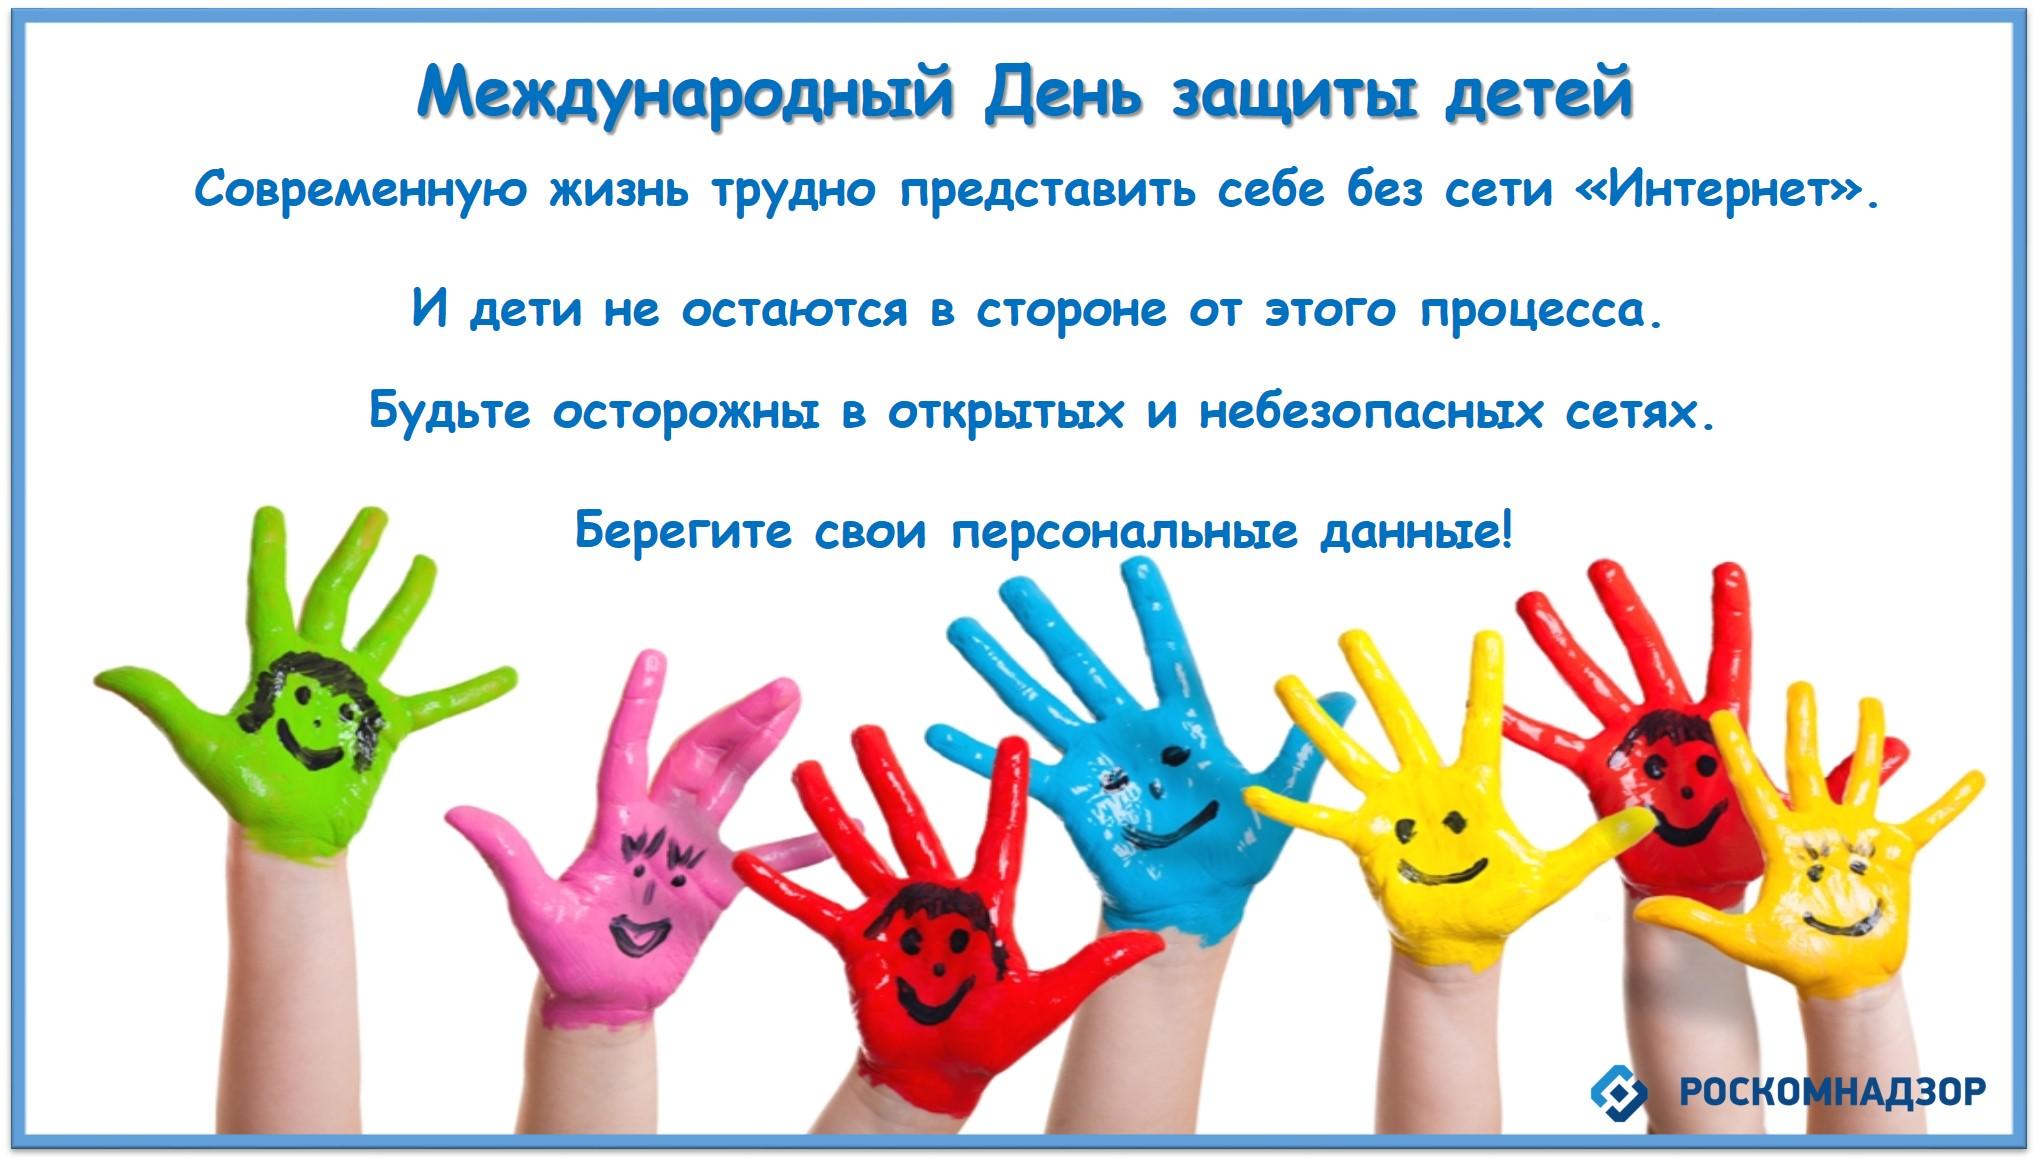 http://krhroo.ucoz.ru/novosti5/buklet_1.jpg